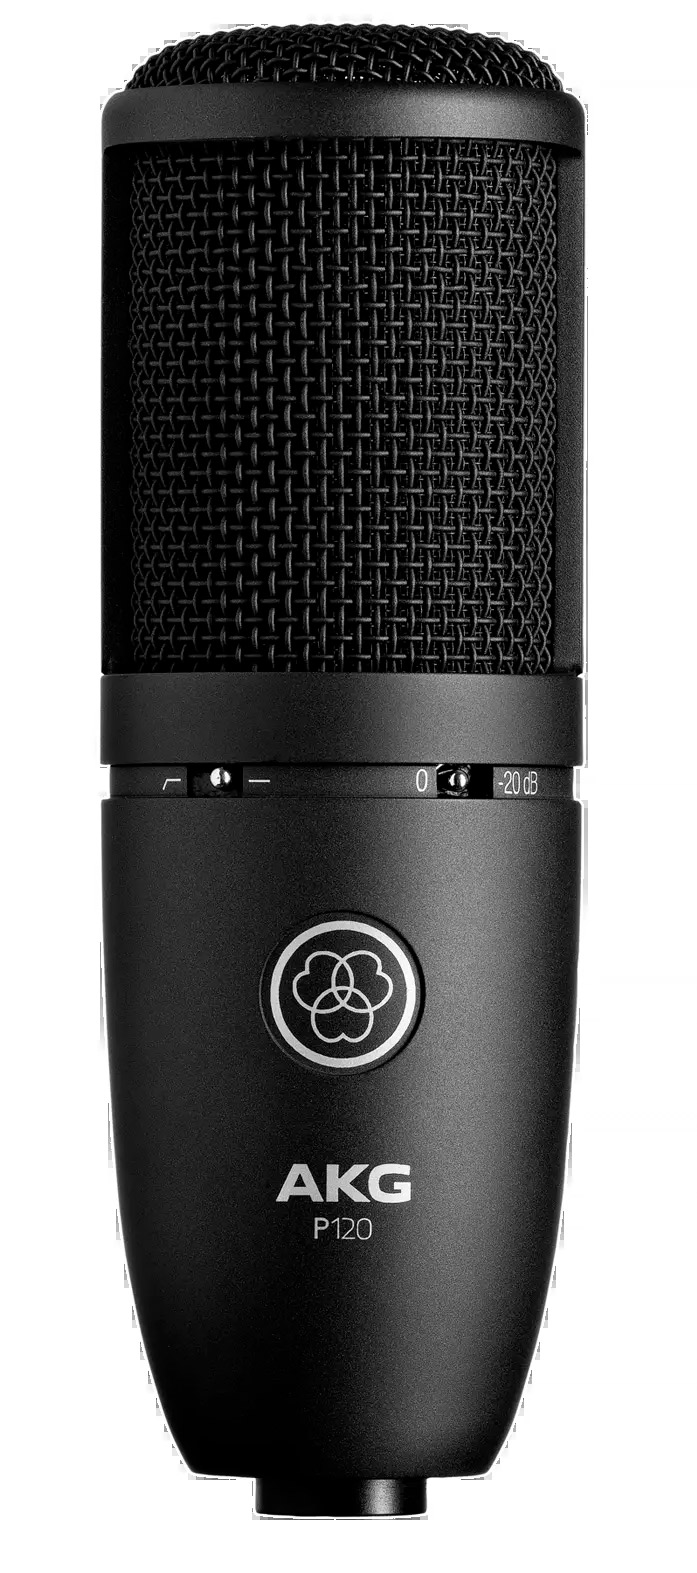 Akg P120 Microfone Cardióide para Studio  - Audio Video & cia